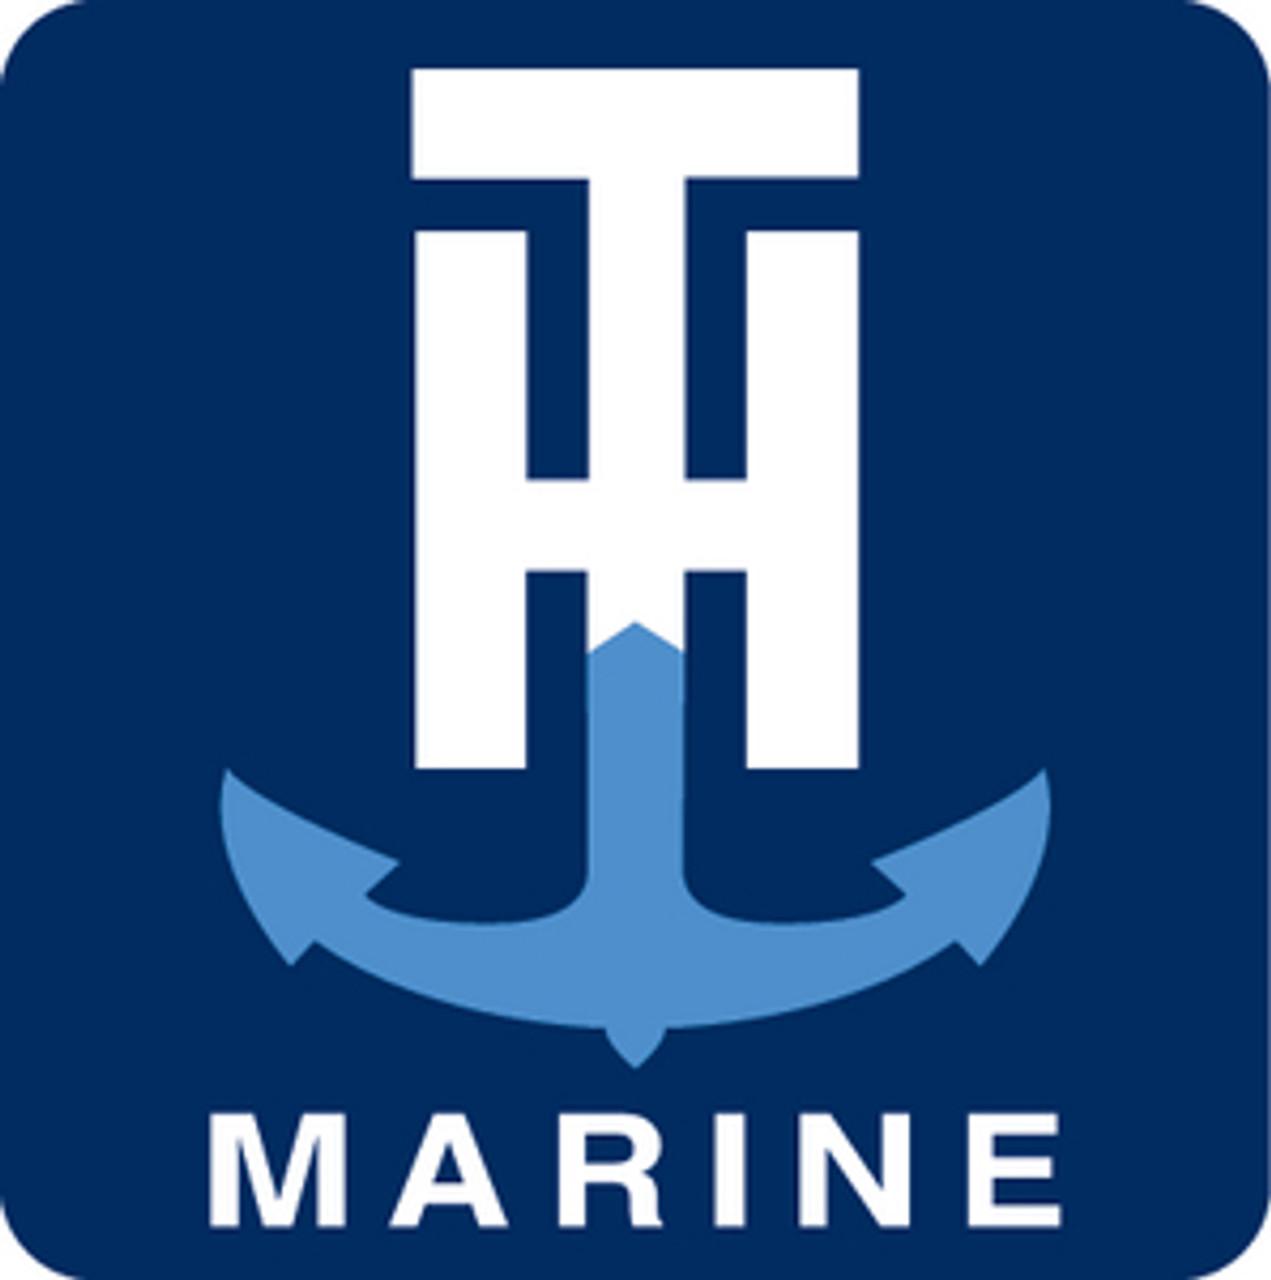 T-H Marine 15/'Whitee Wash Down Coiled Hose Wdhbr15Wbdp